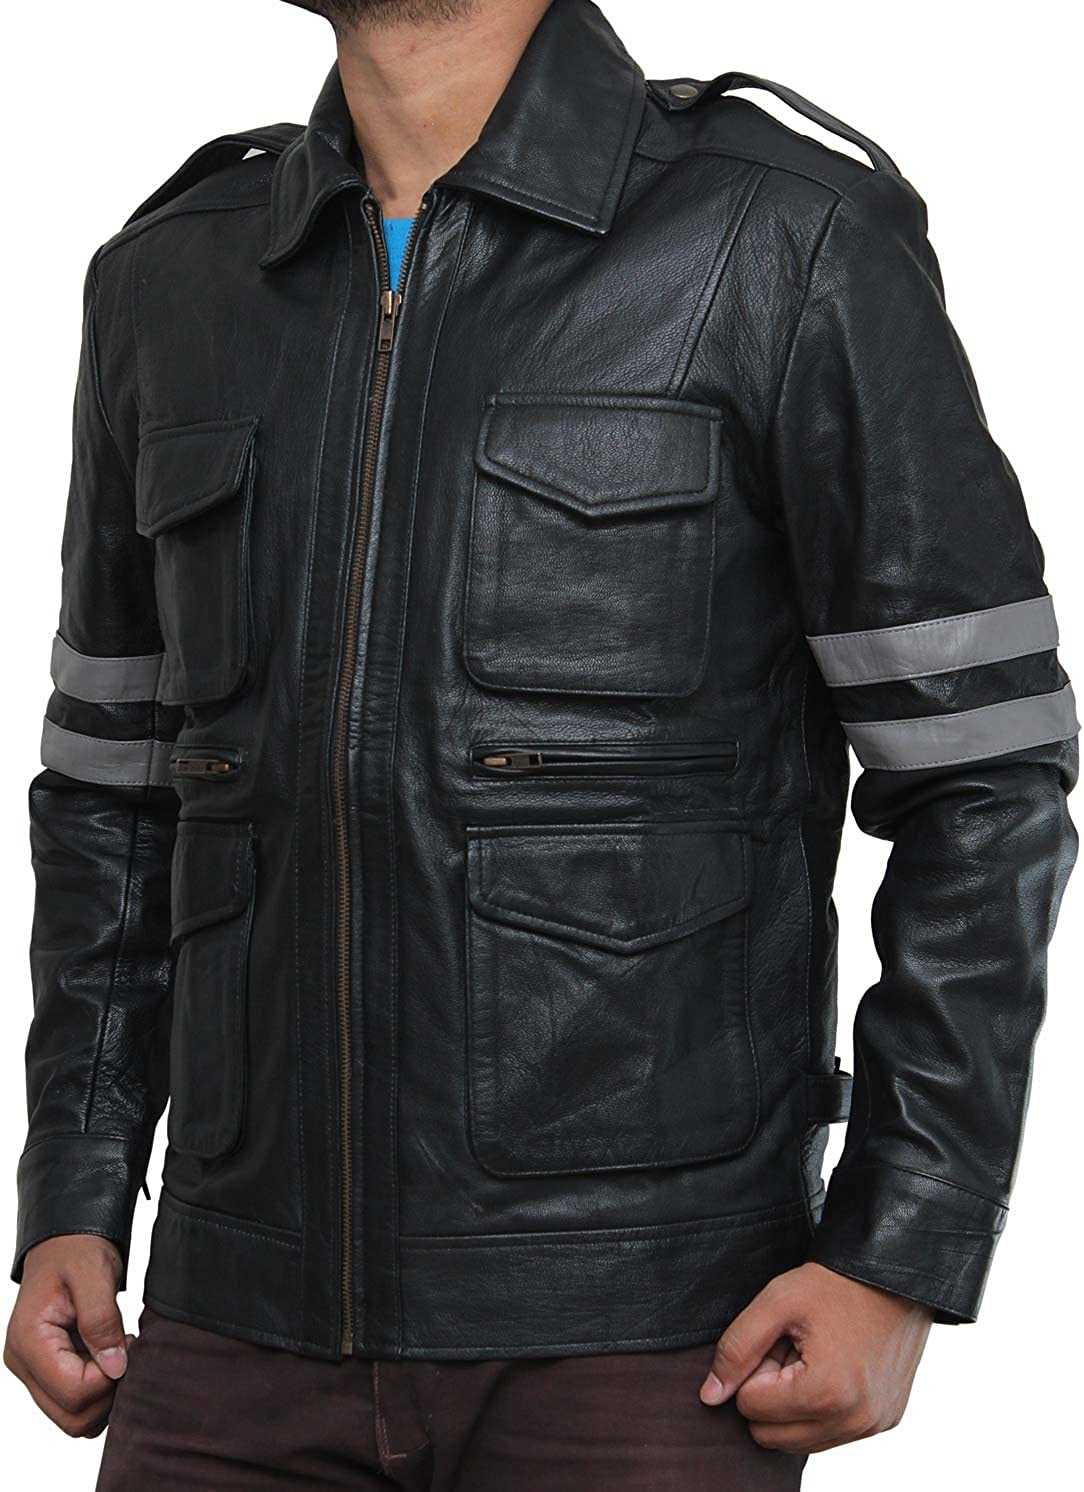 Decrum Resident 6 Kennedy Jacket L, Black - Resident 6